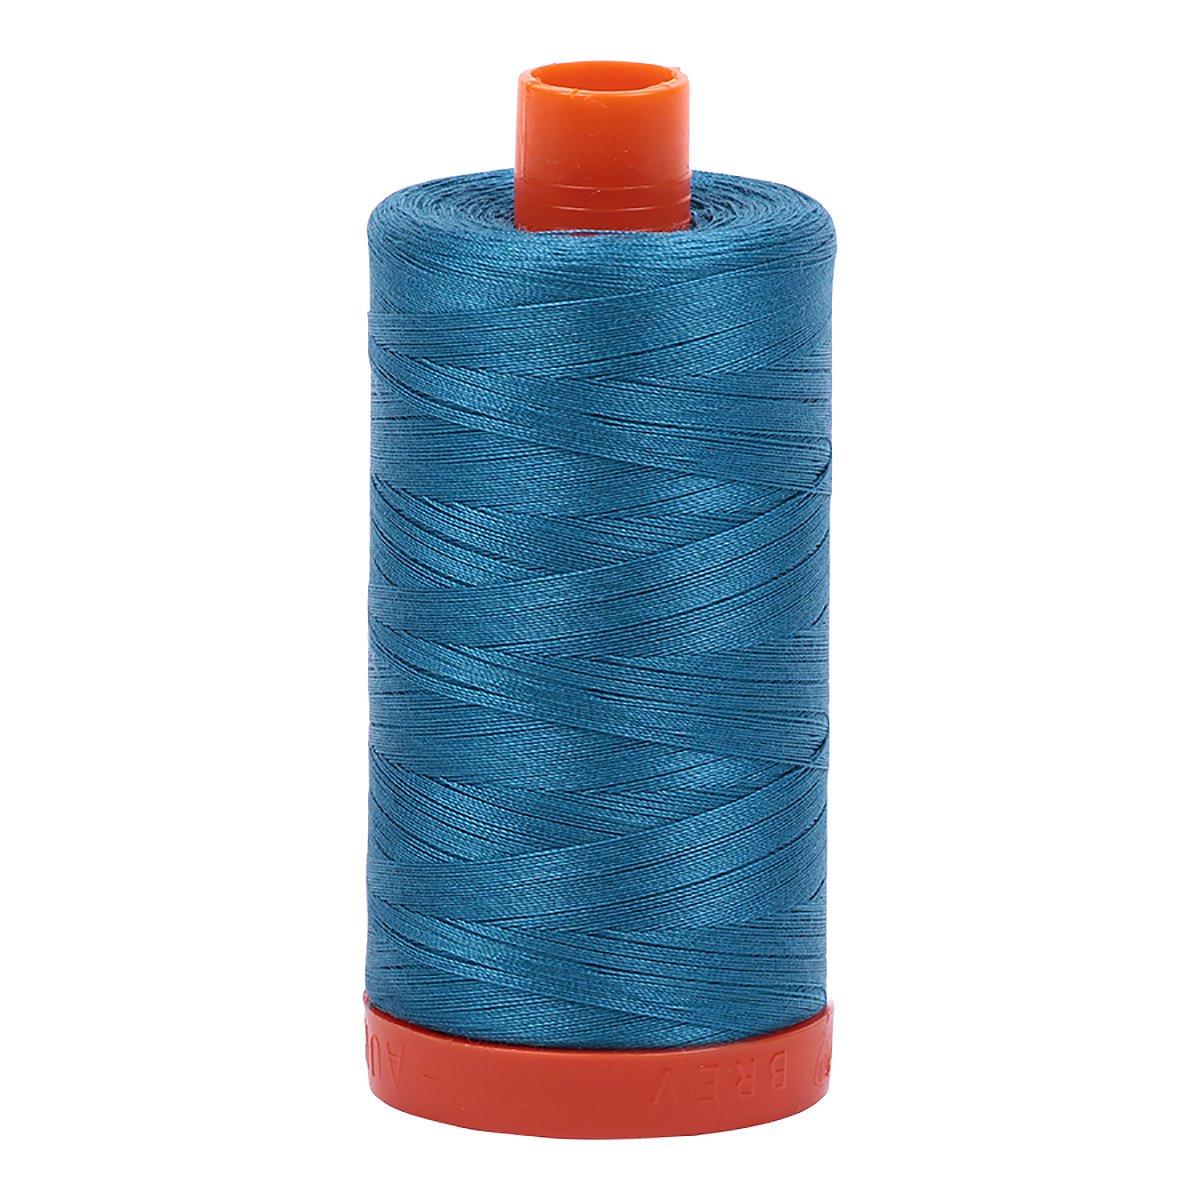 Aurifil A1050-1125 Solid 50wt 1422yds Medium Teal Mako Cotton Thread Aurifil USA